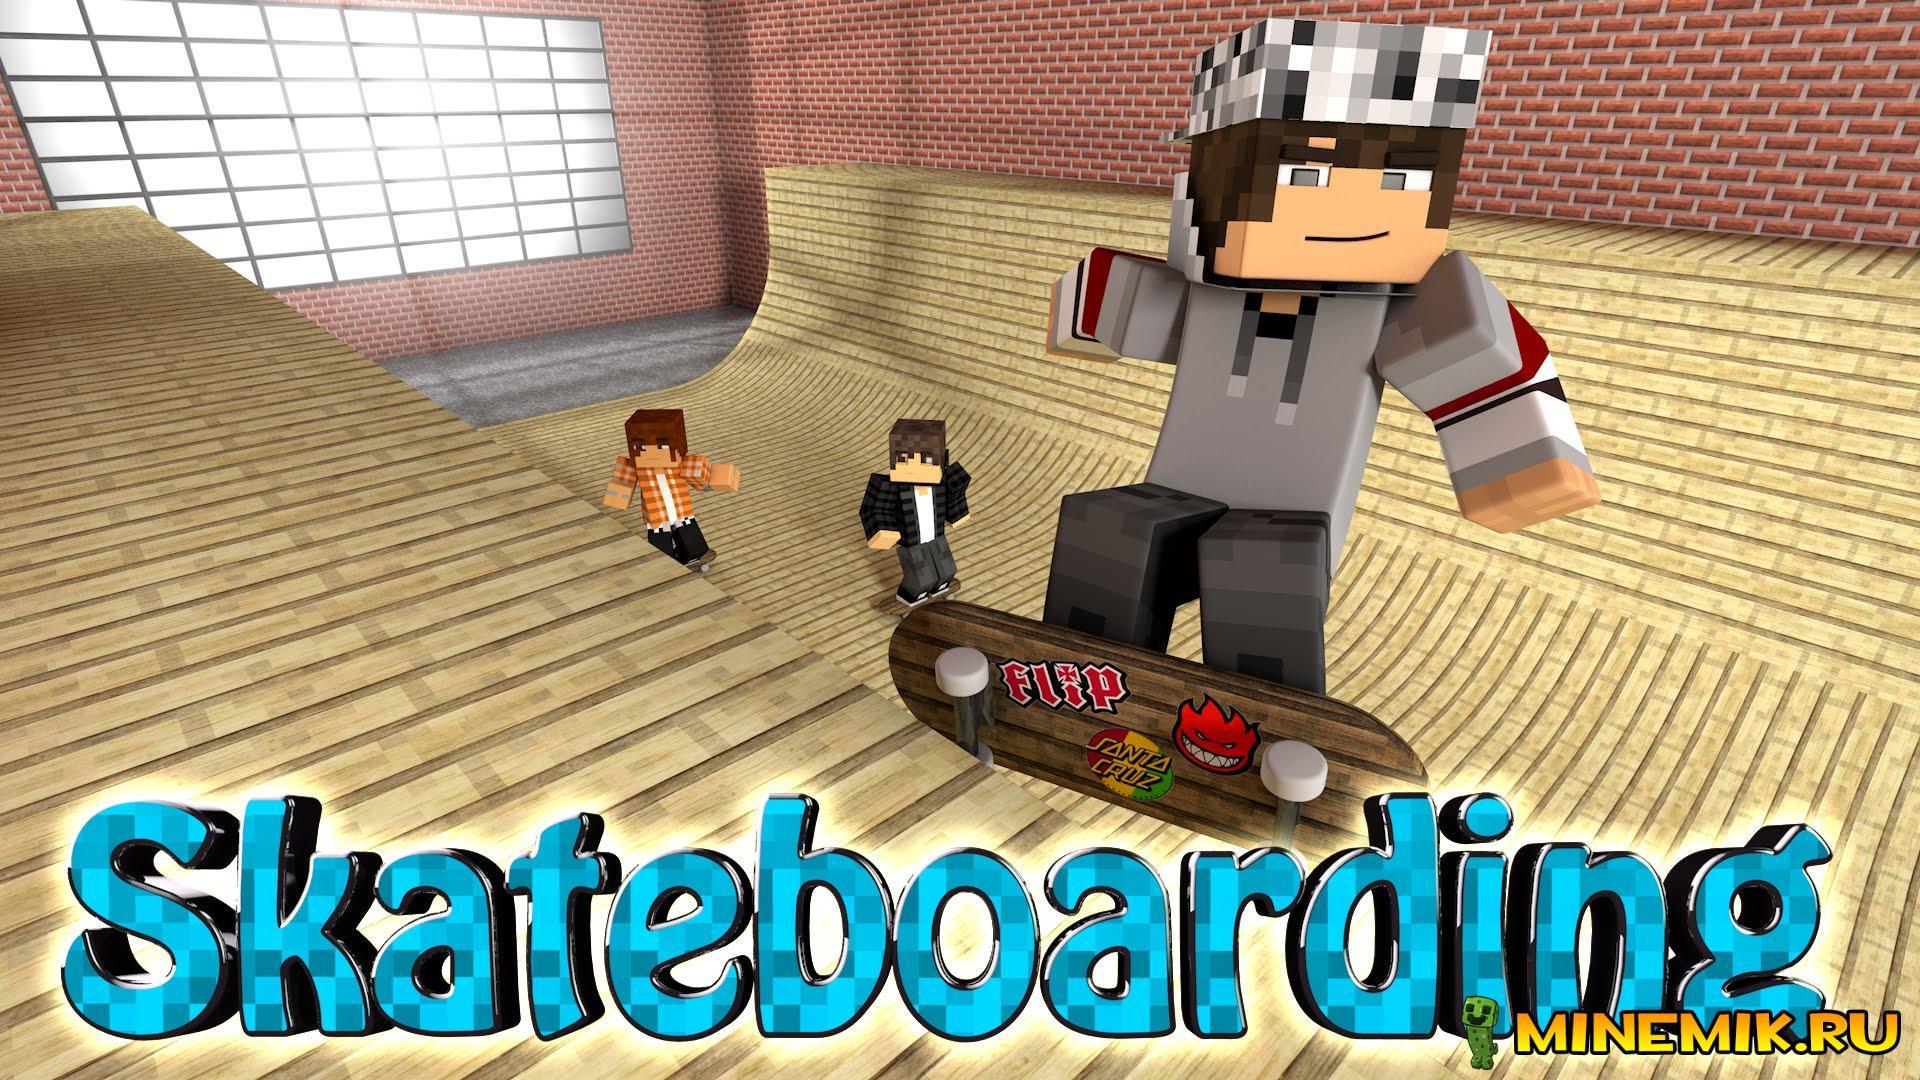 Skateboard Mod - мод на скейтборд для MCPE